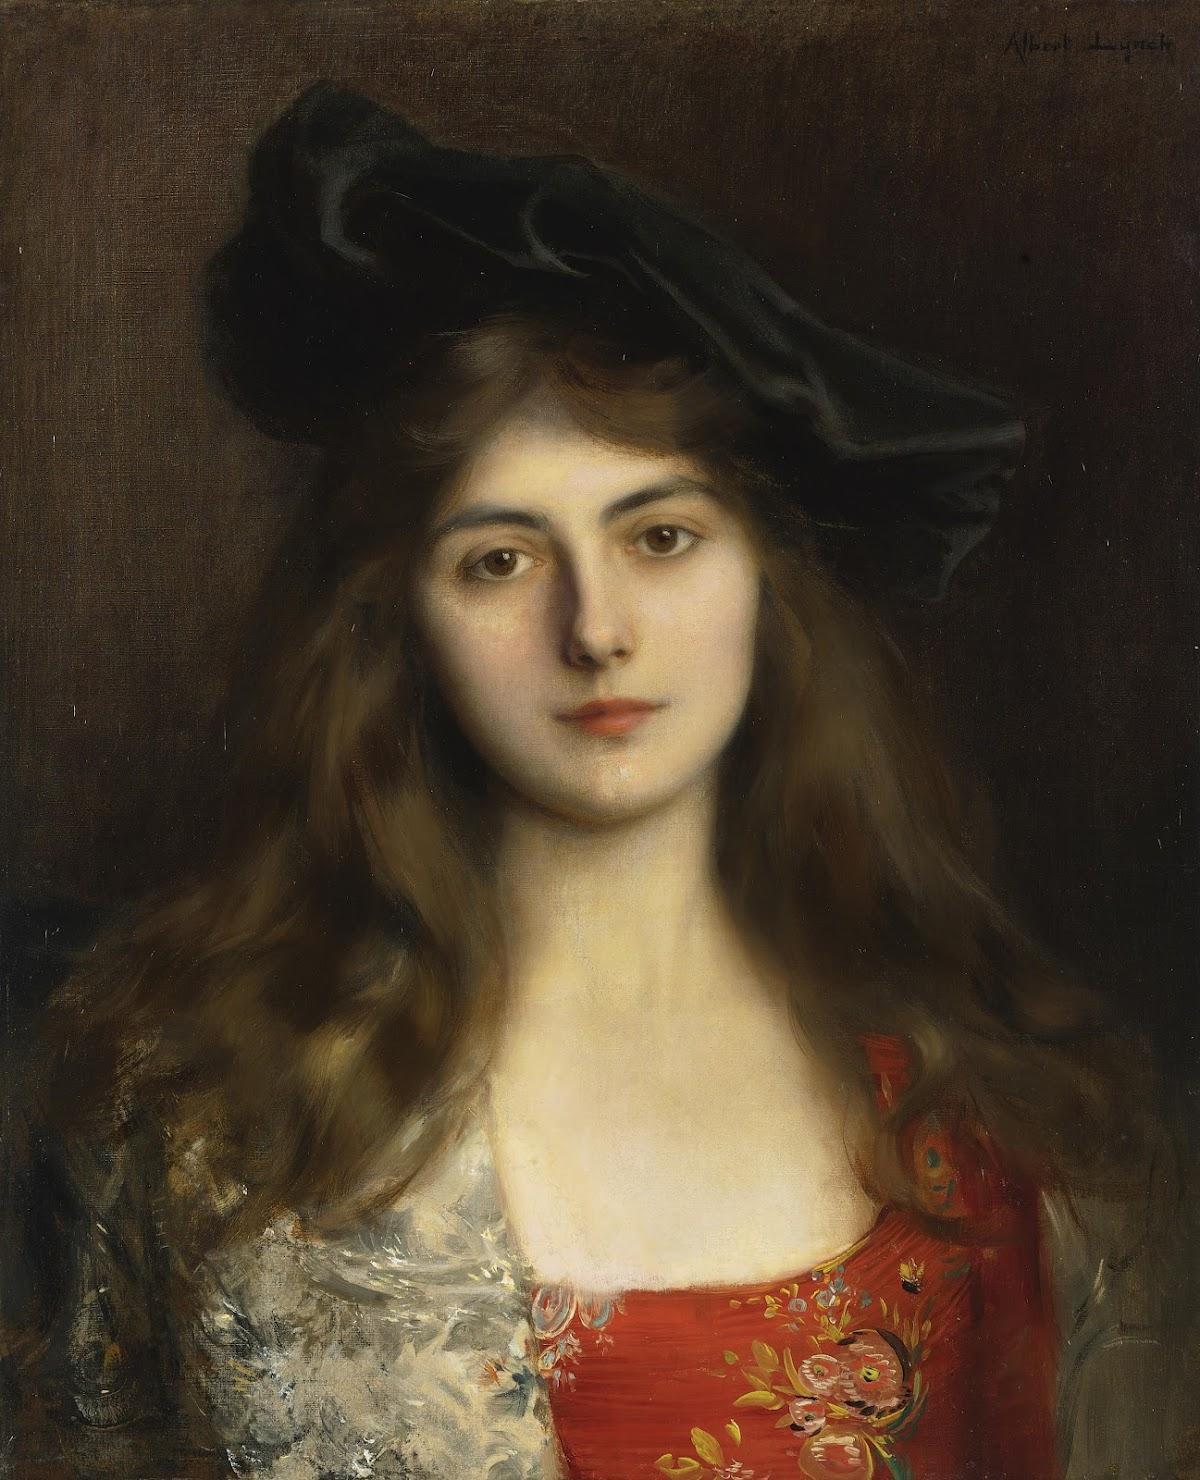 http://4.bp.blogspot.com/-g6kAUPW5GWA/UGsR5YYjoKI/AAAAAAABIaw/0jtOiKoCiDI/s1480/Albert+Lynch+(Peruvian+artist,+1851-1912)+Portrait-of-a-Young-Woman.jpg